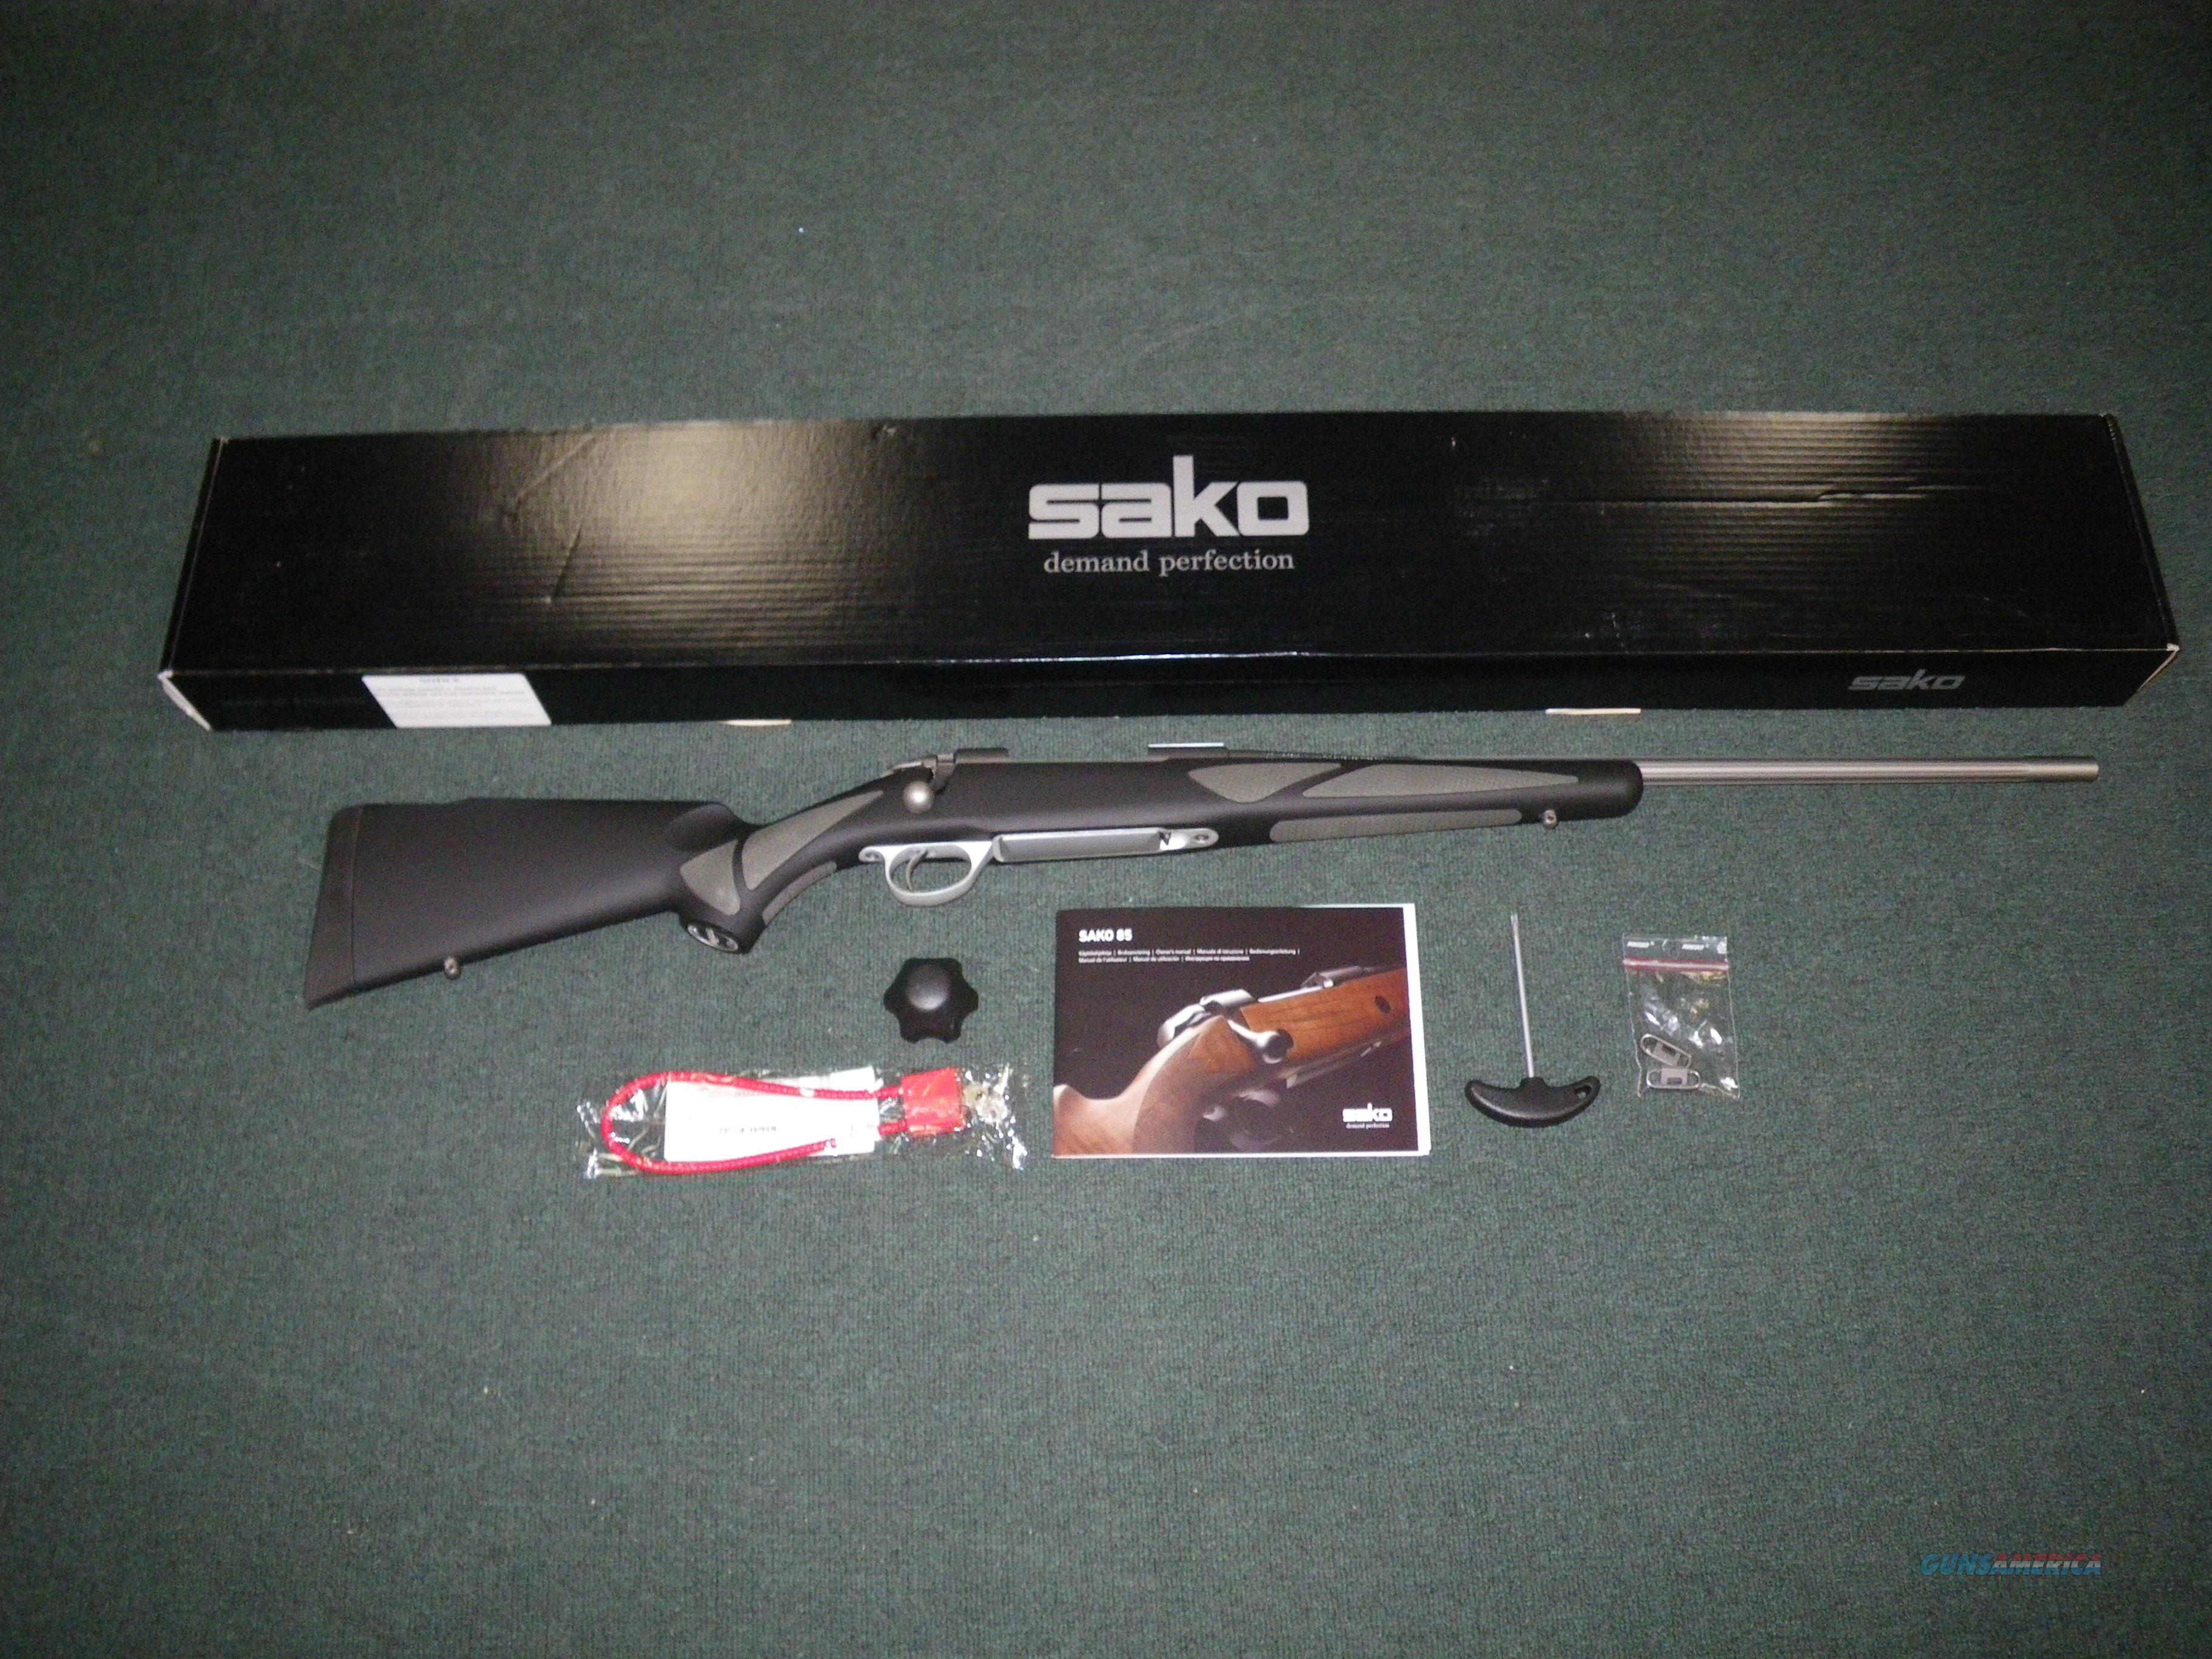 "Sako 85 Finnlight 243 Win 20.3"" Stainless NEW #JRSFL15  Guns > Rifles > Sako Rifles > M85 Series"